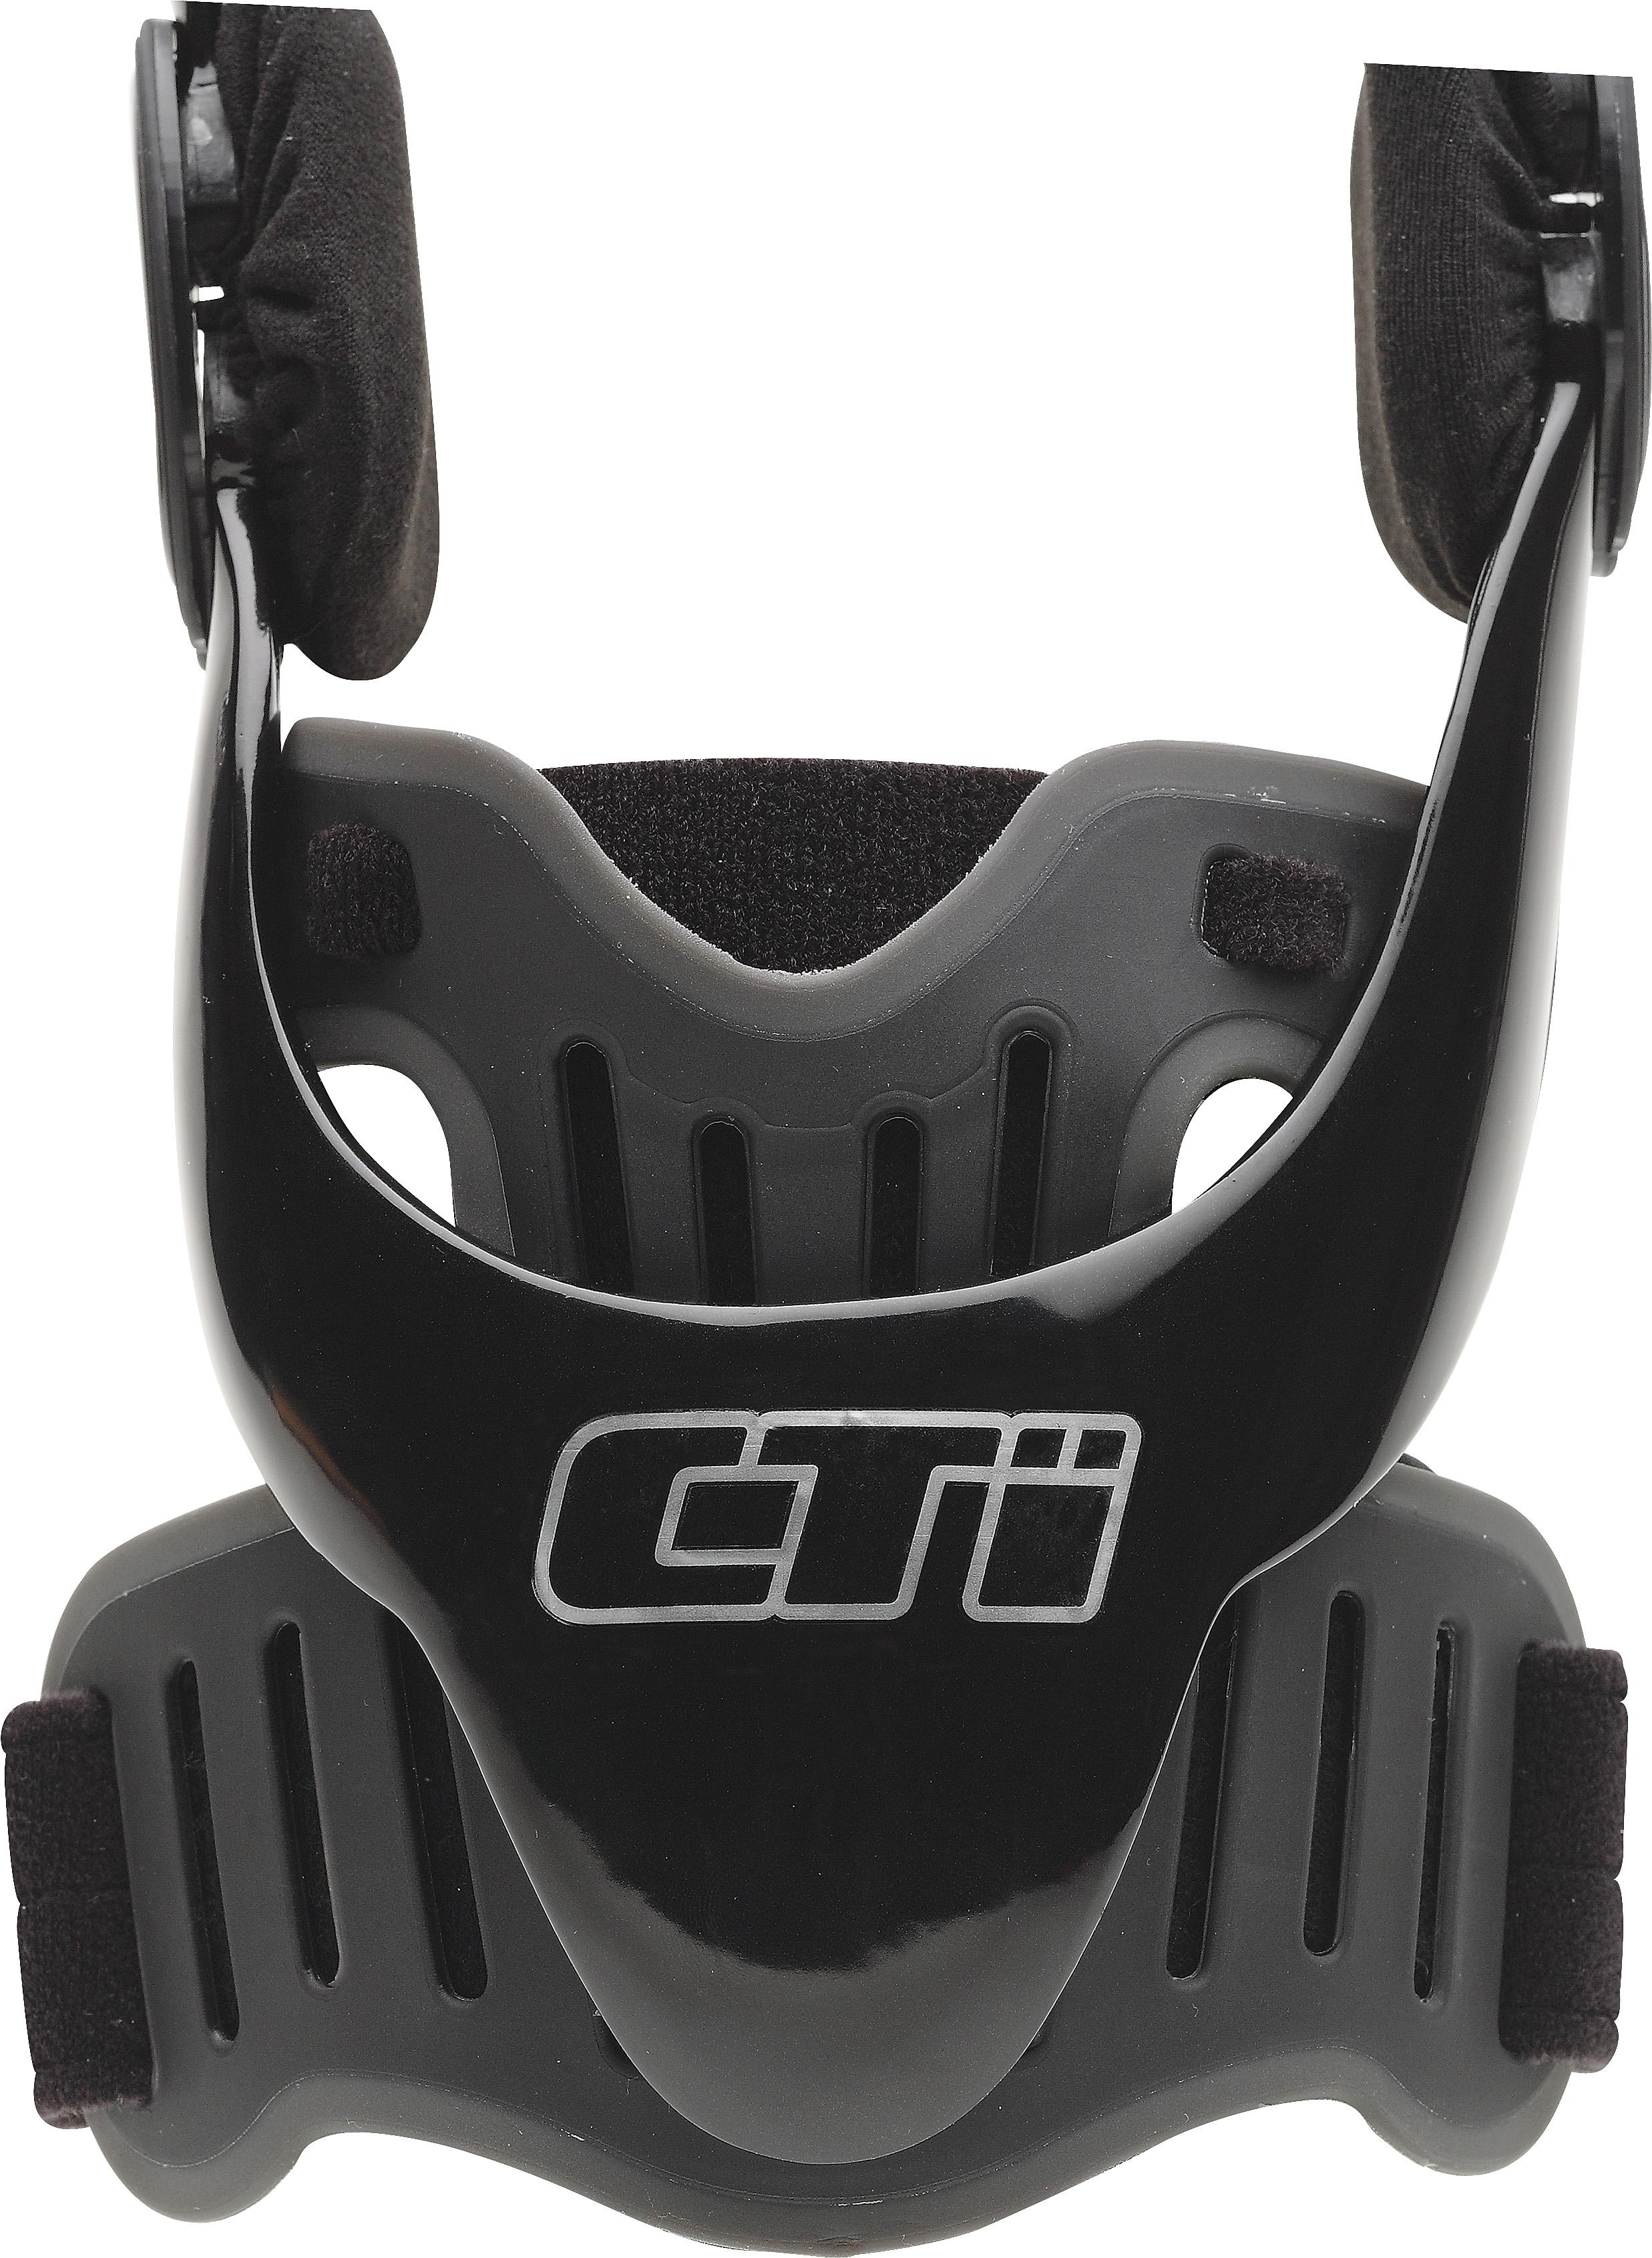 cti-ots-pro-sport-left-small-b-239600112-ossur-os377932-7.jpg